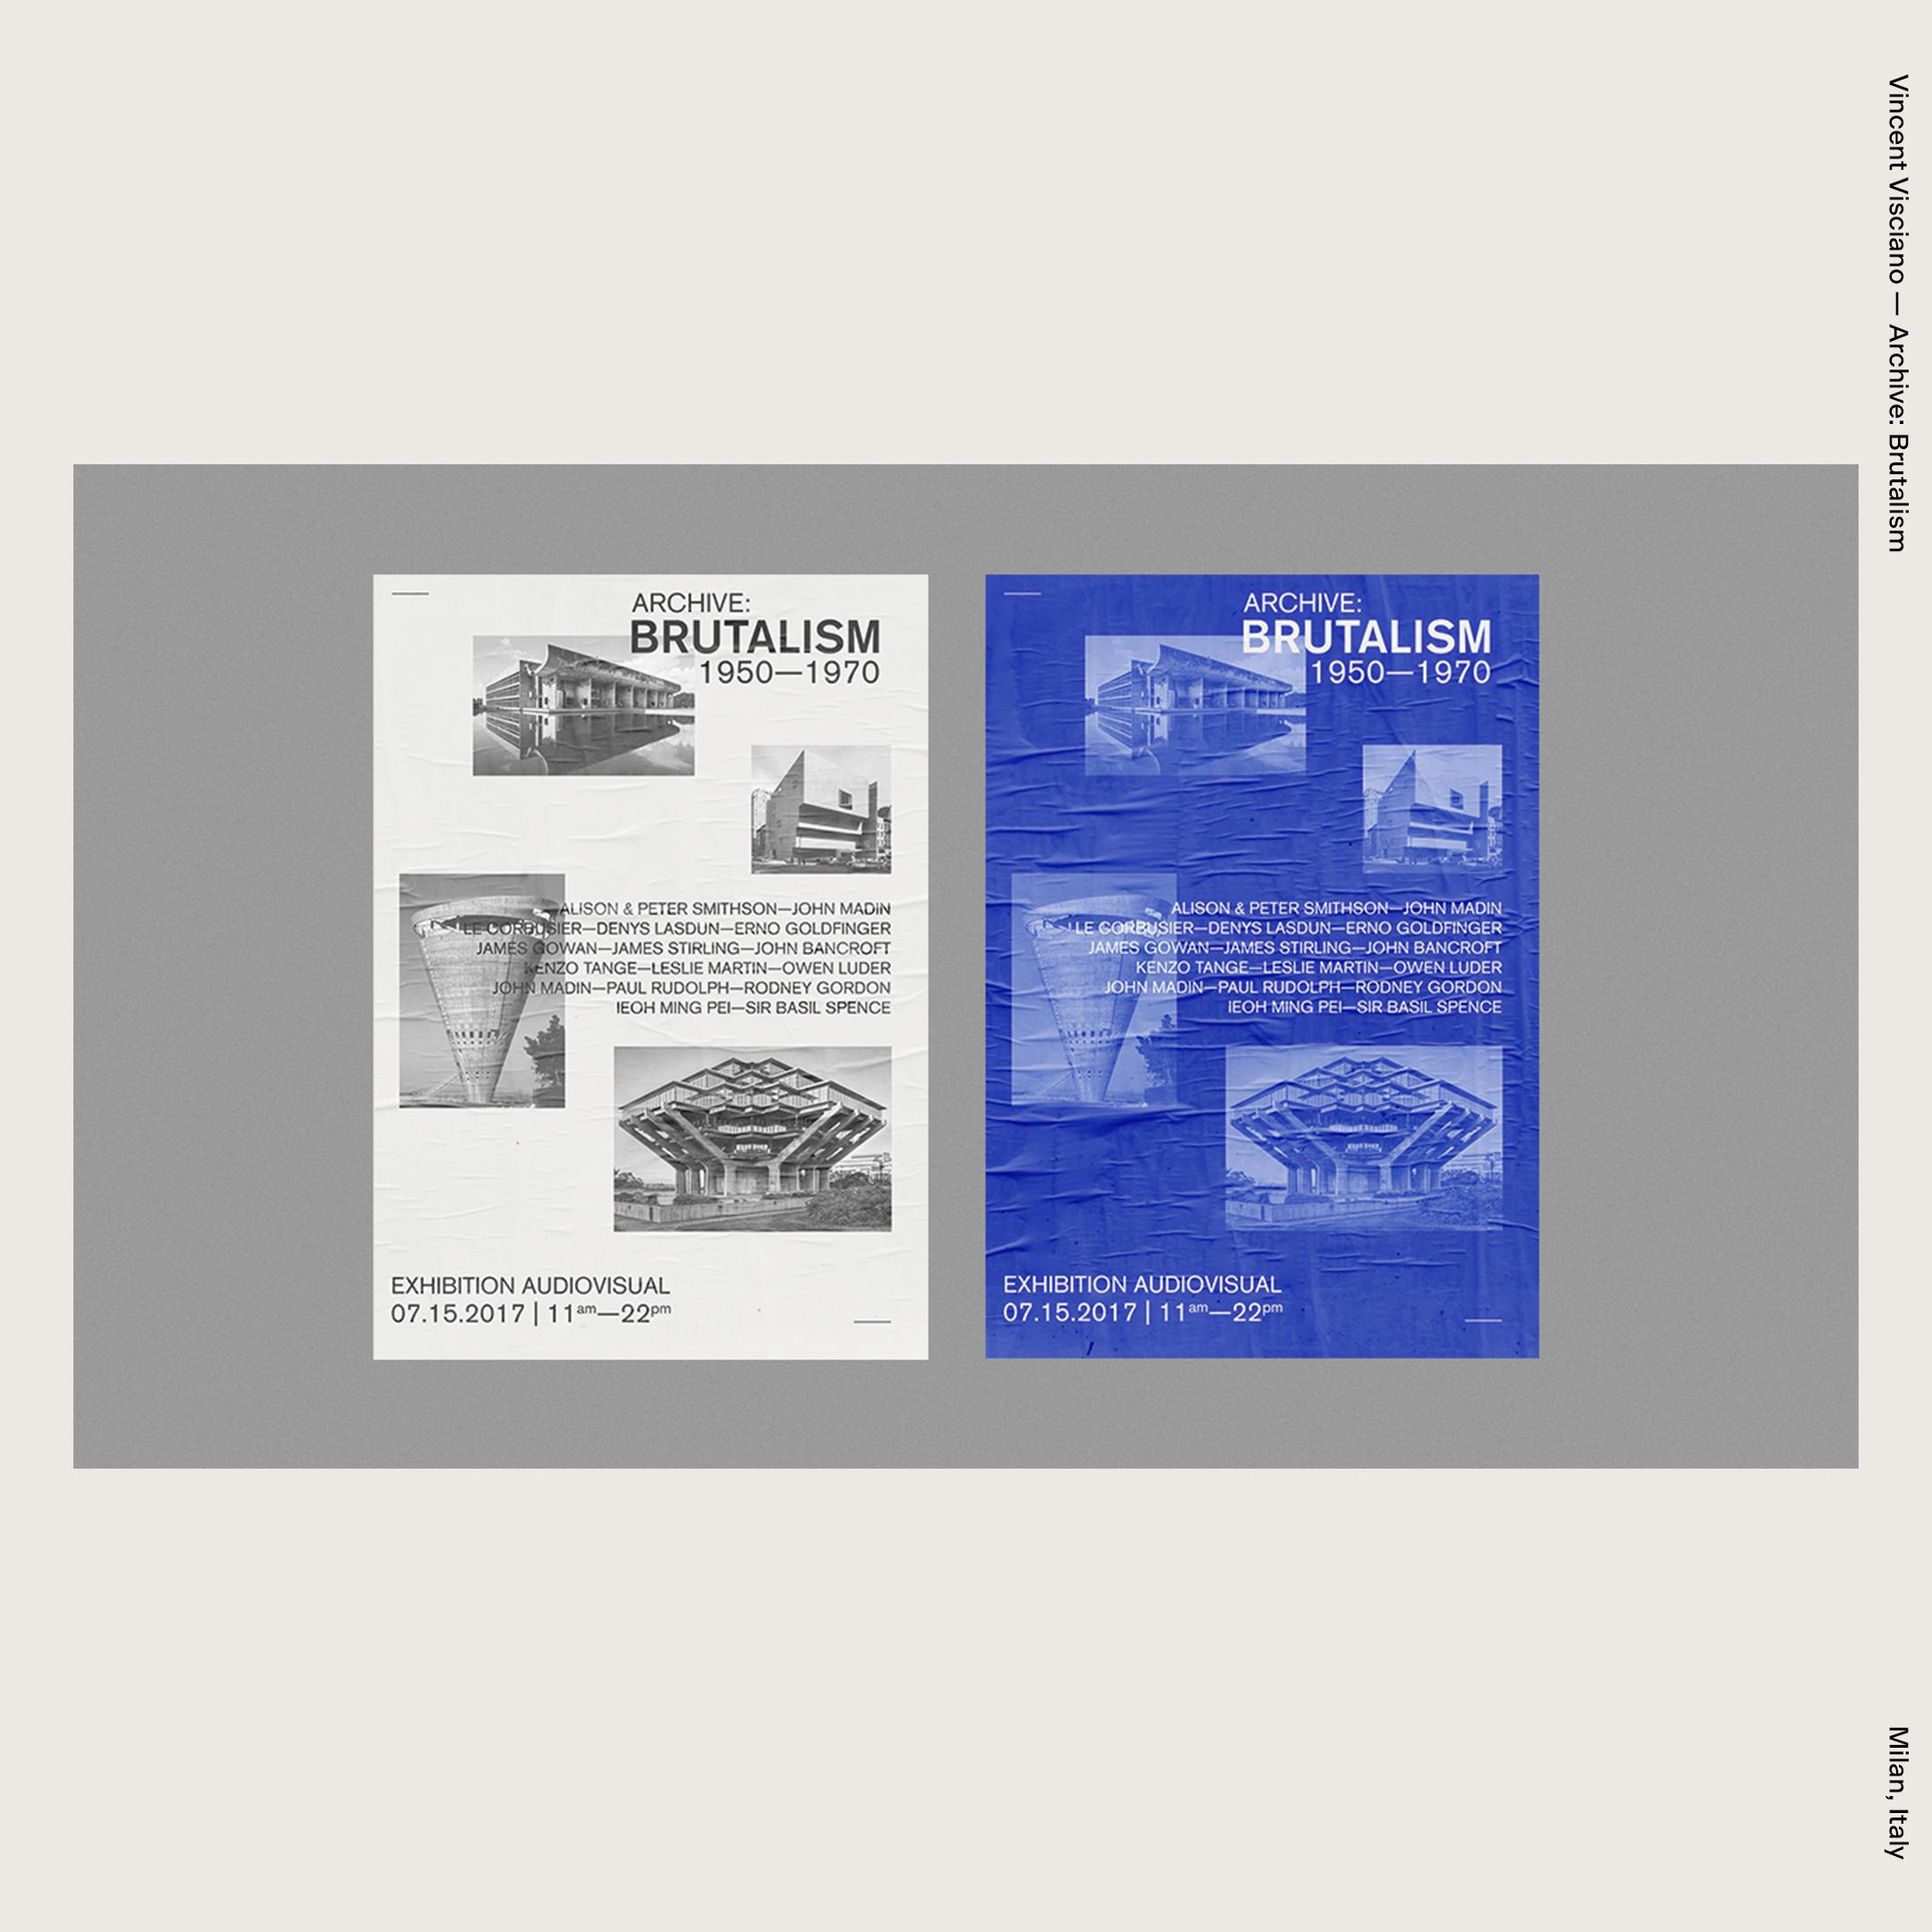 Vincent Visciano — Archive: Brutalism